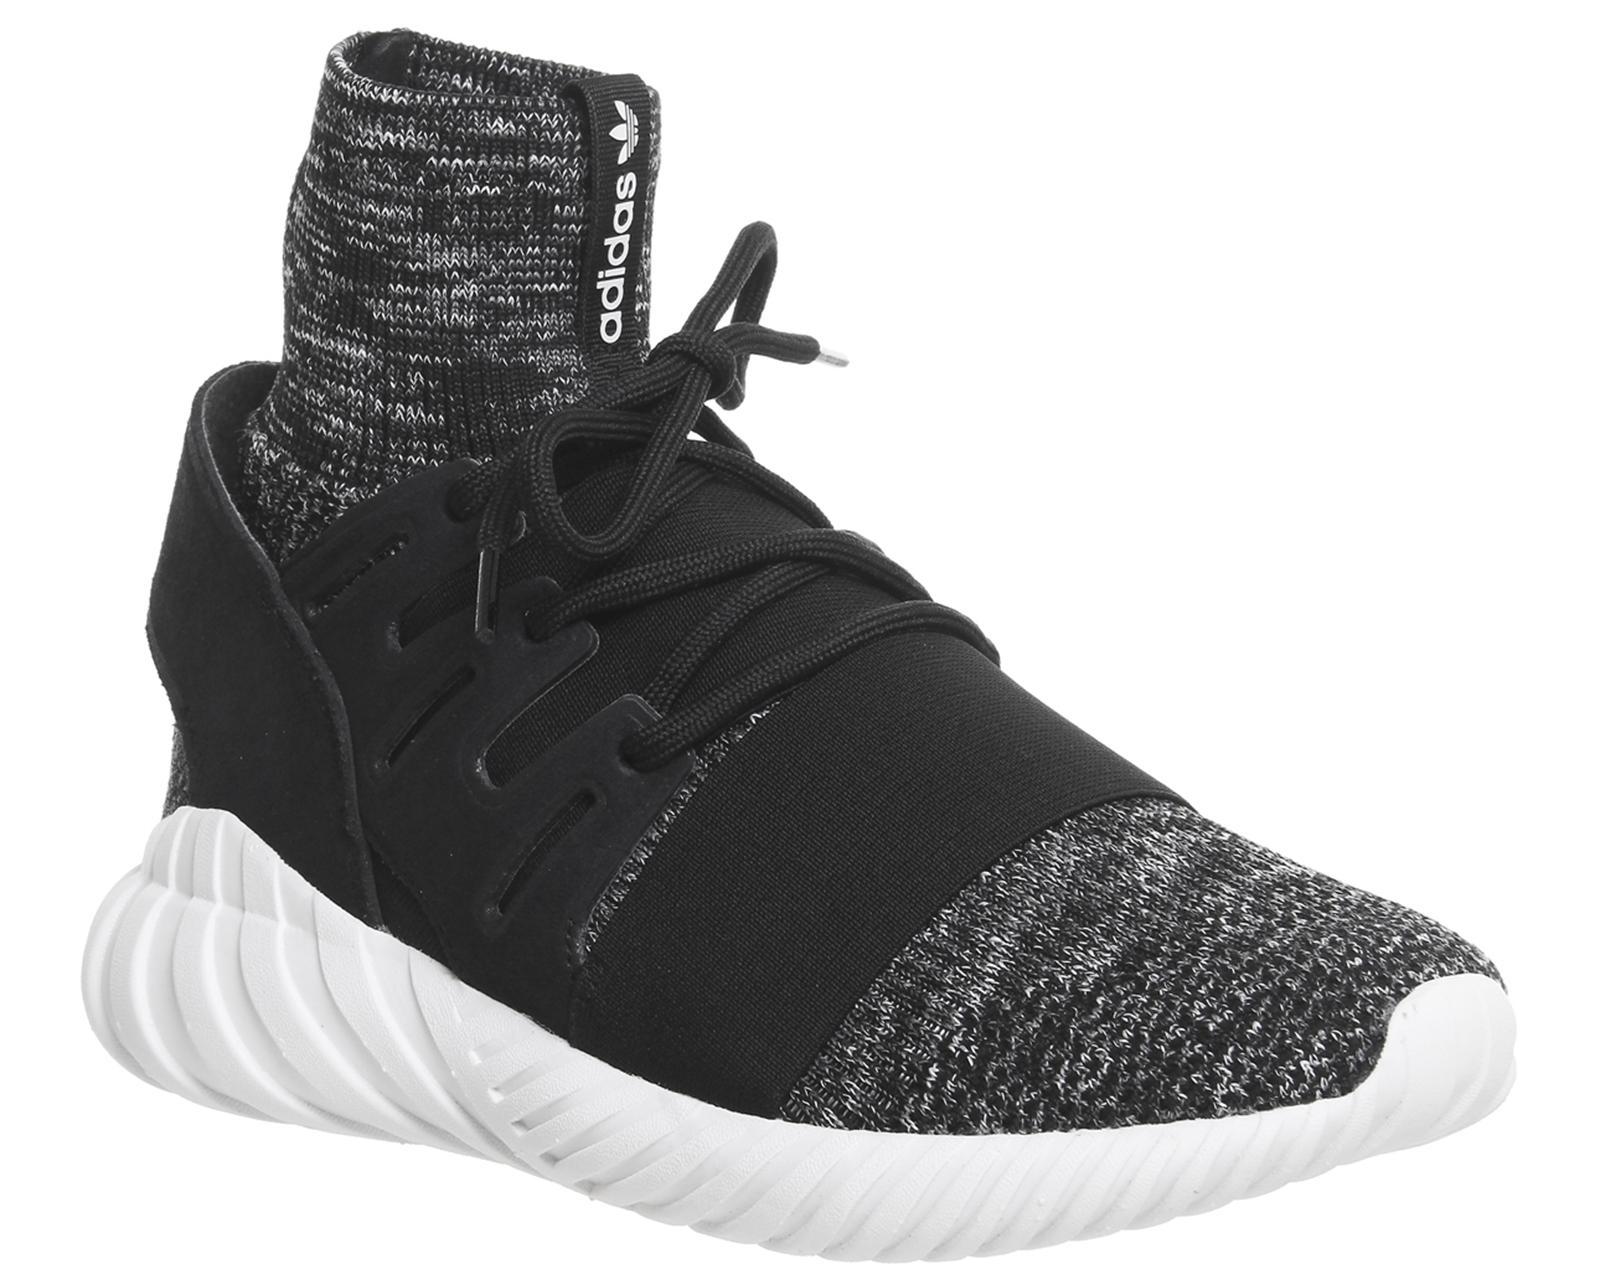 Chaussures Adidas Tubular Doom - Noir